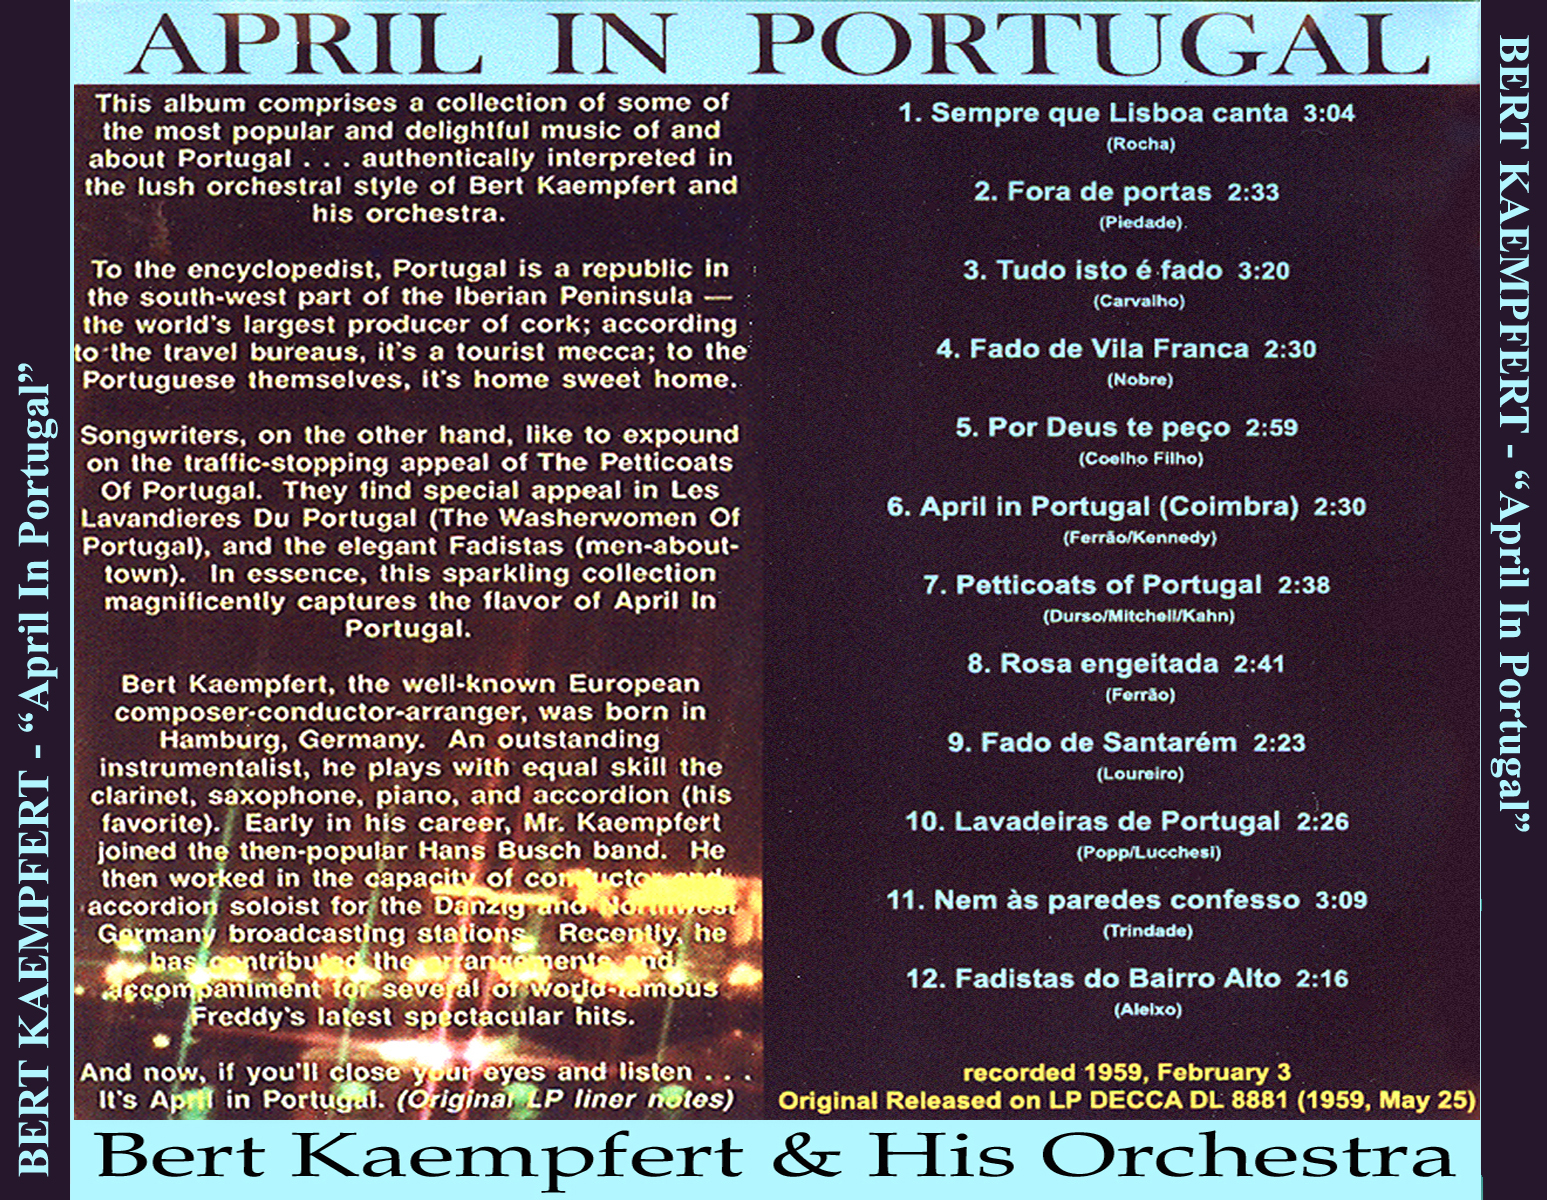 Bert Kaempfert E Sua Orquestra O Som Maravilhoso De Bert Kaempfert